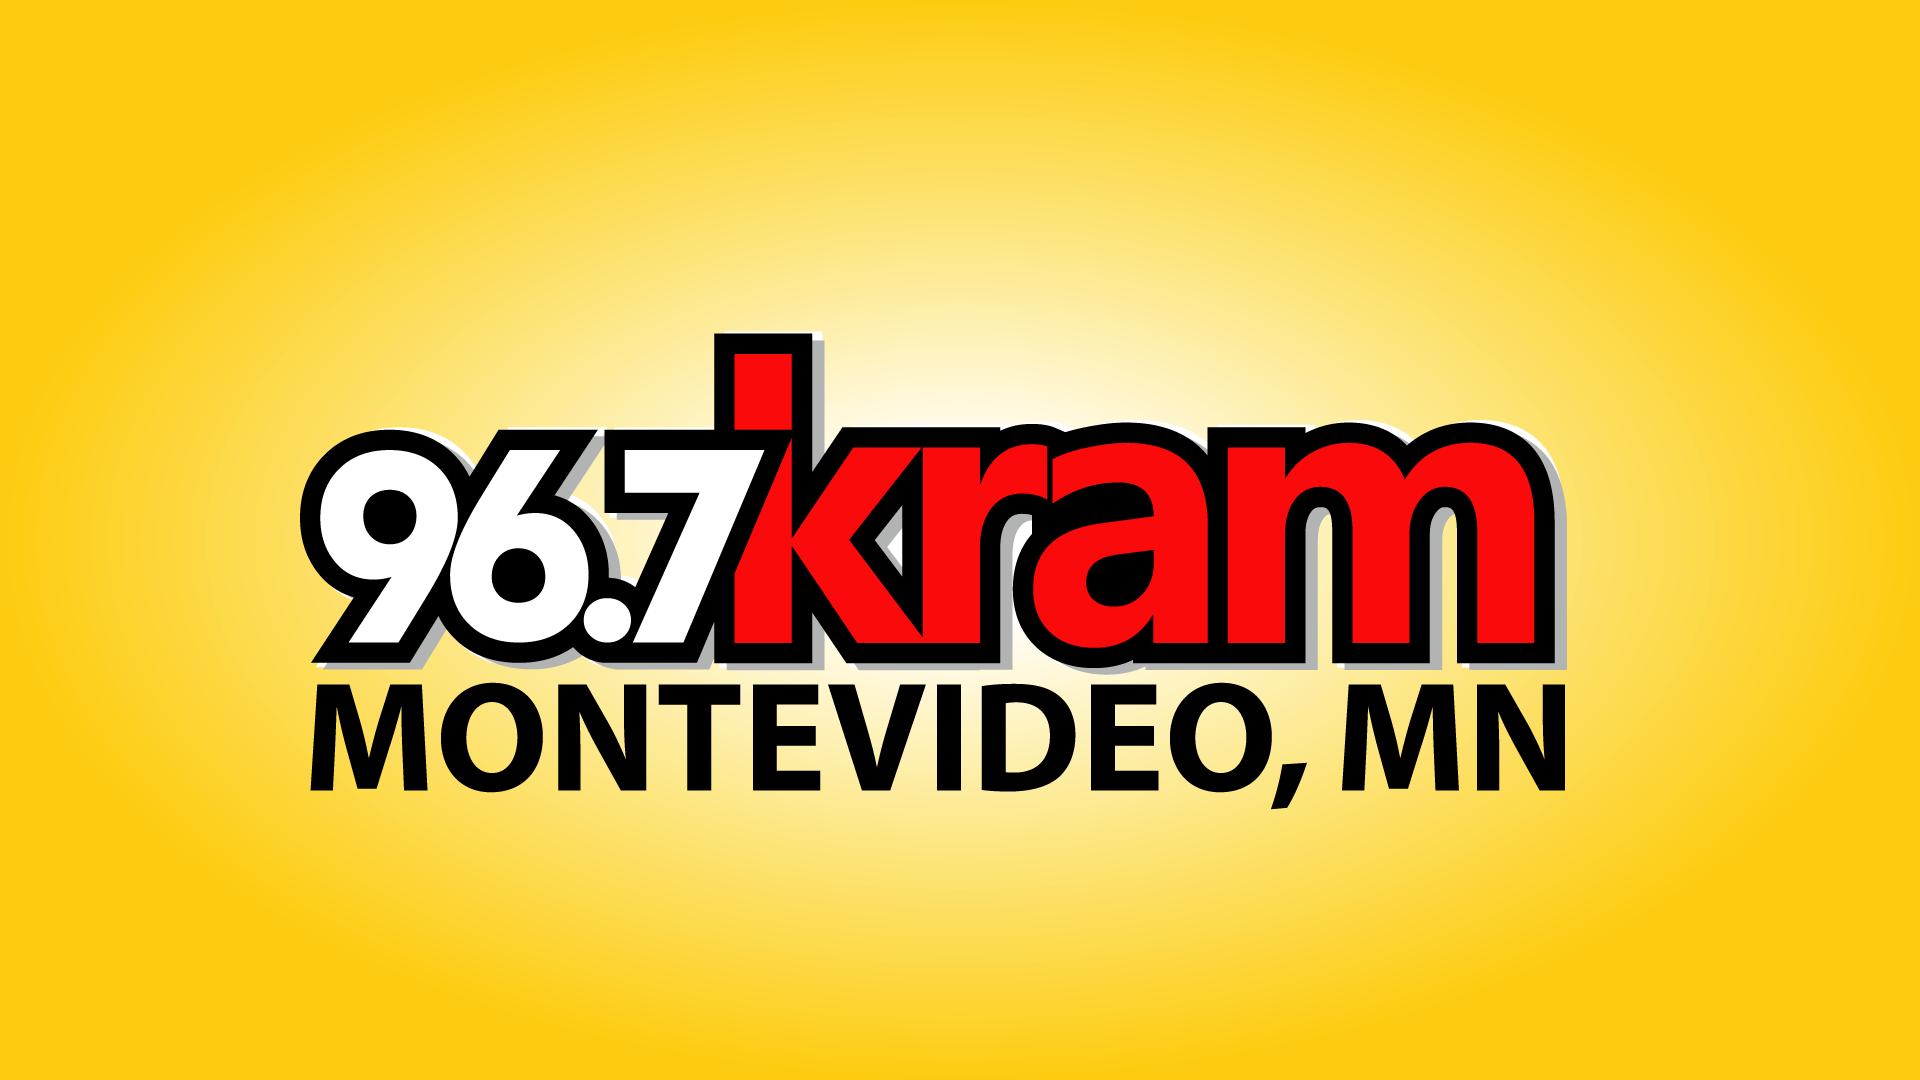 96.7 KRAM logo